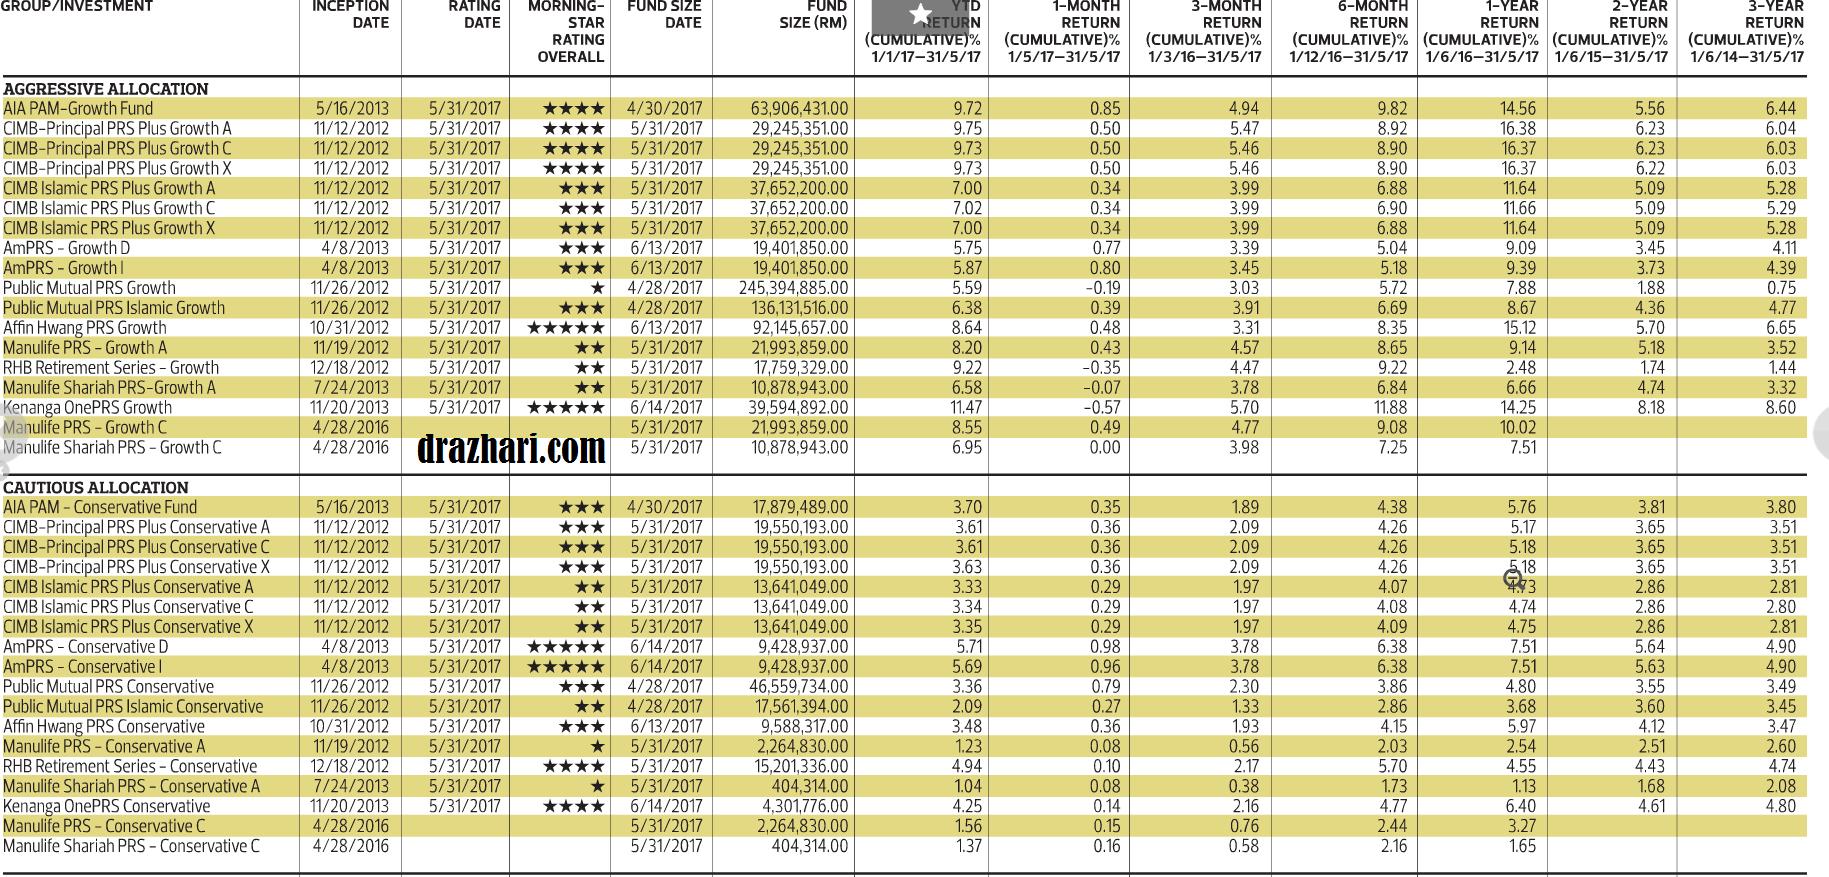 PRS Rating 1